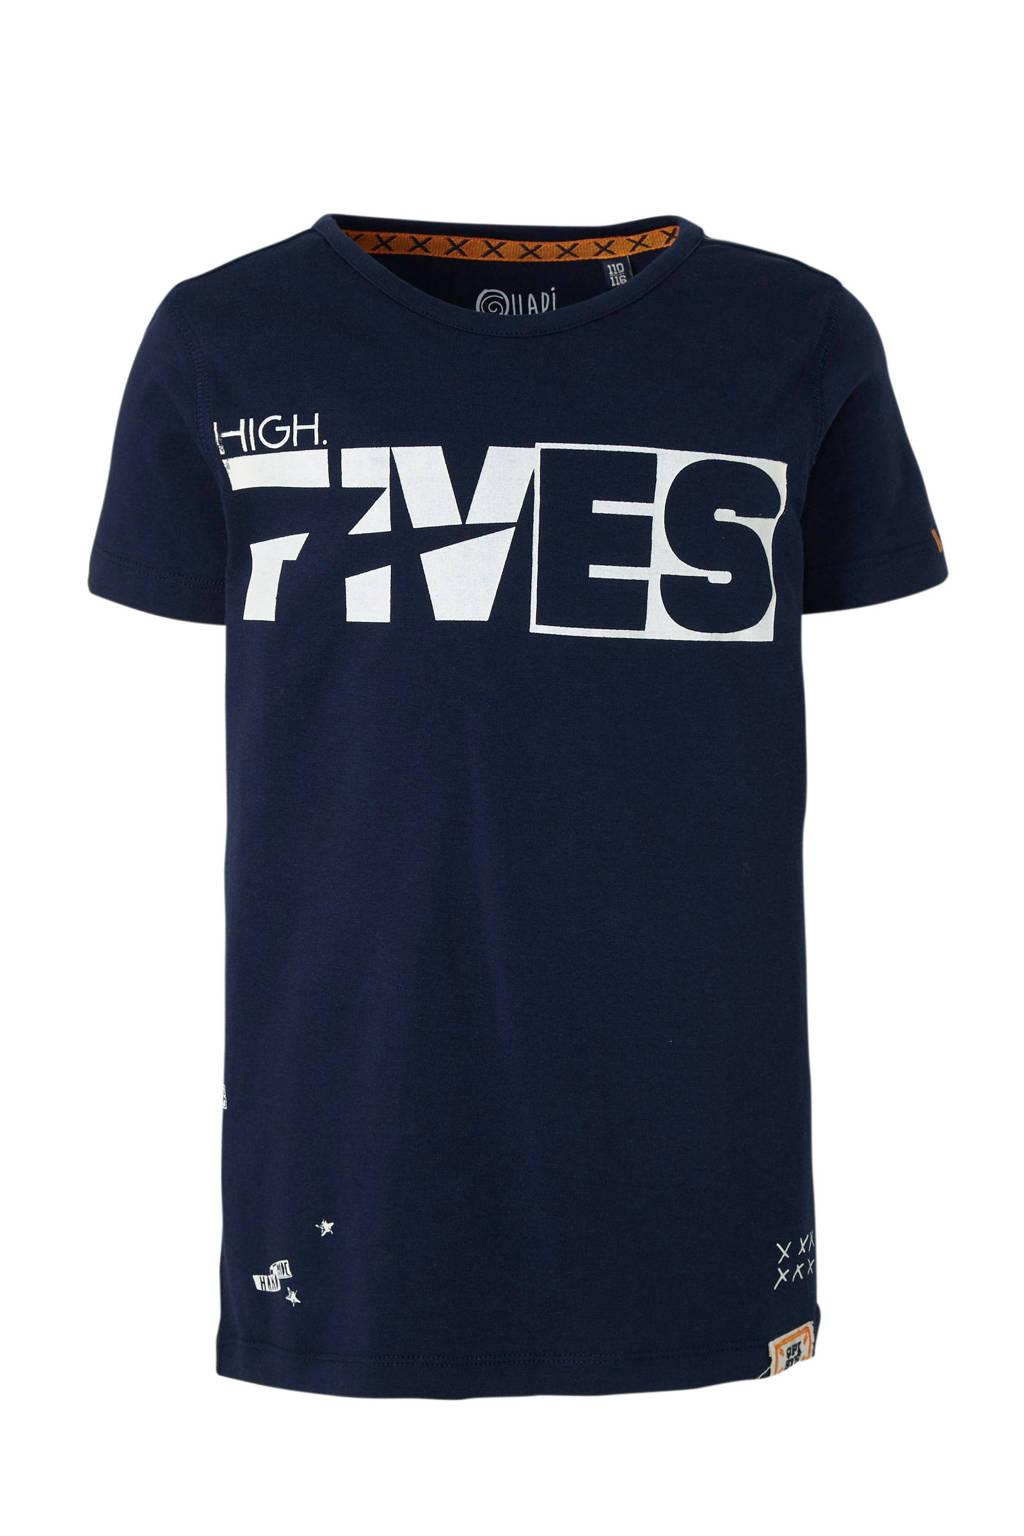 Quapi T-shirt Alec met printopdruk donkerblauw/wit, Donkerblauw/wit